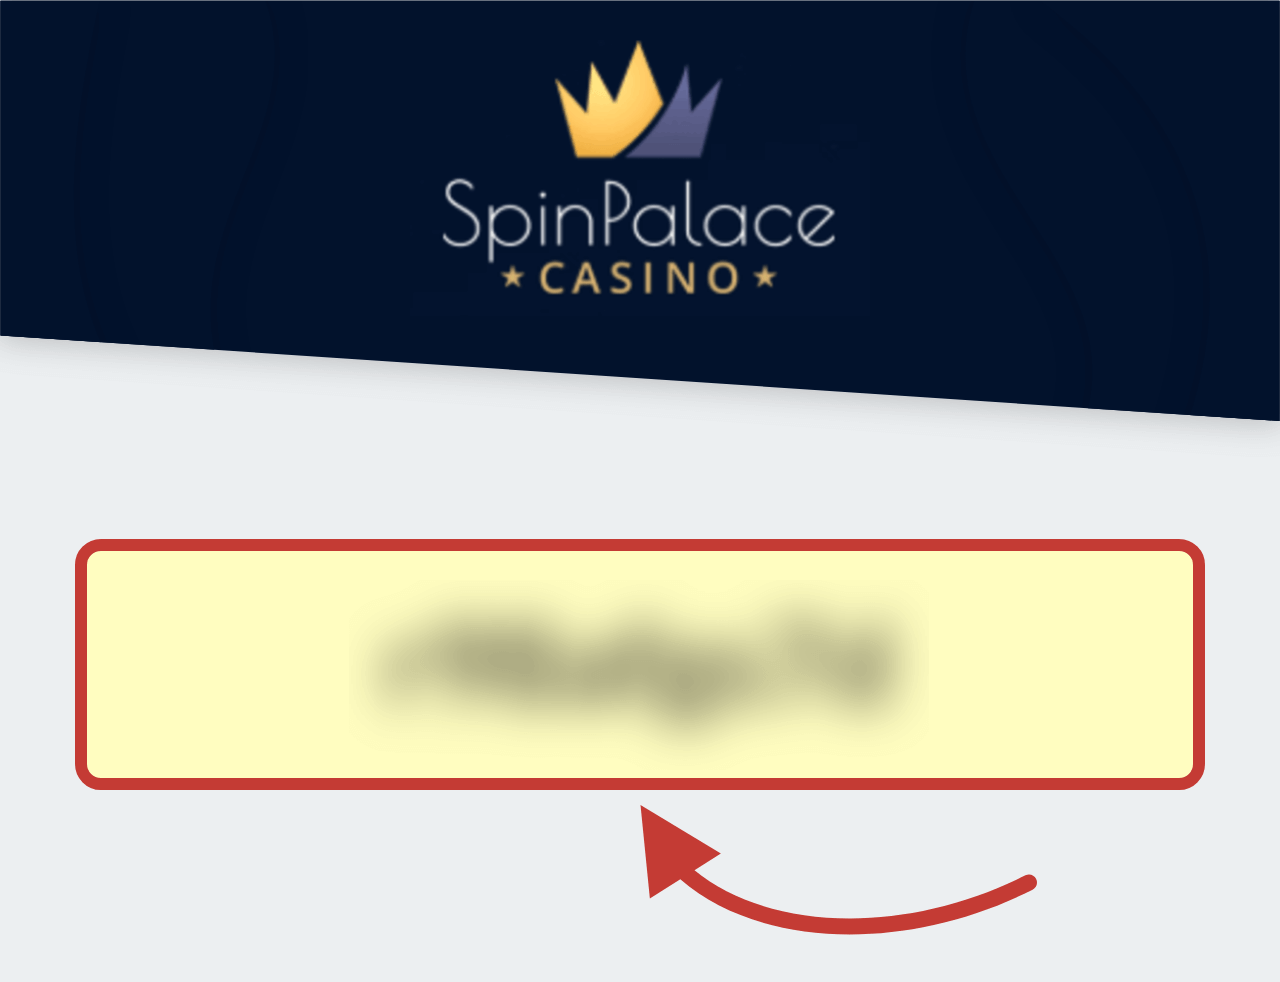 Spin Palace Casino Bonus Code